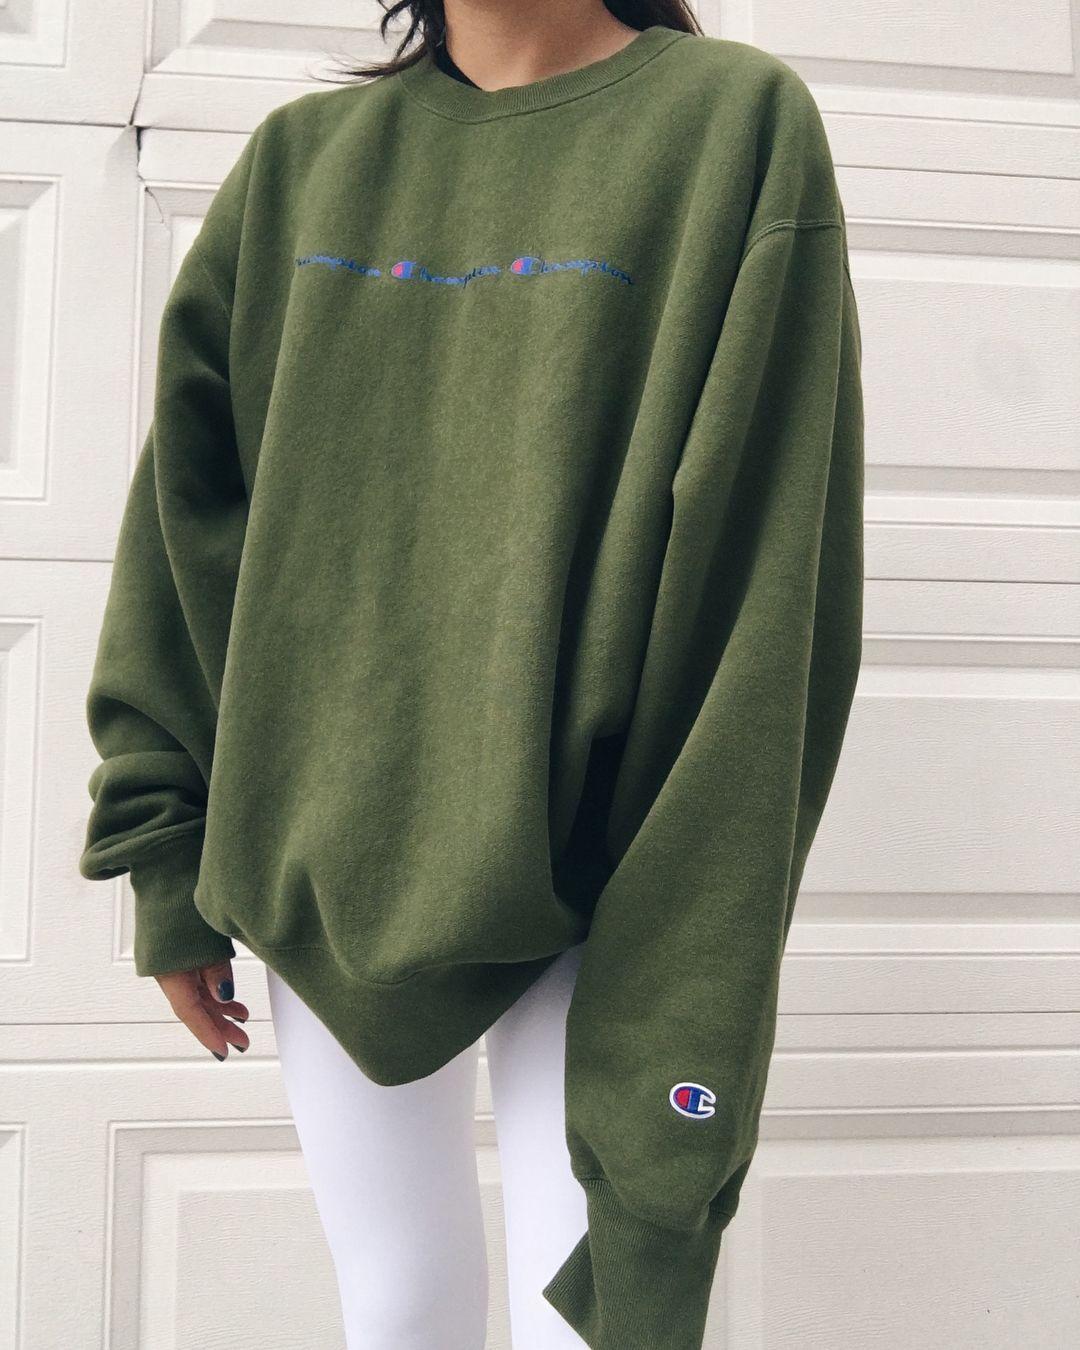 Johns Creek Ga On Instagram Sold Dark Green Oversized Champion Hoodie So Oversized Hoodie Outfit Oversized Sweatshirt Outfit Champion Hoodie [ 1350 x 1080 Pixel ]